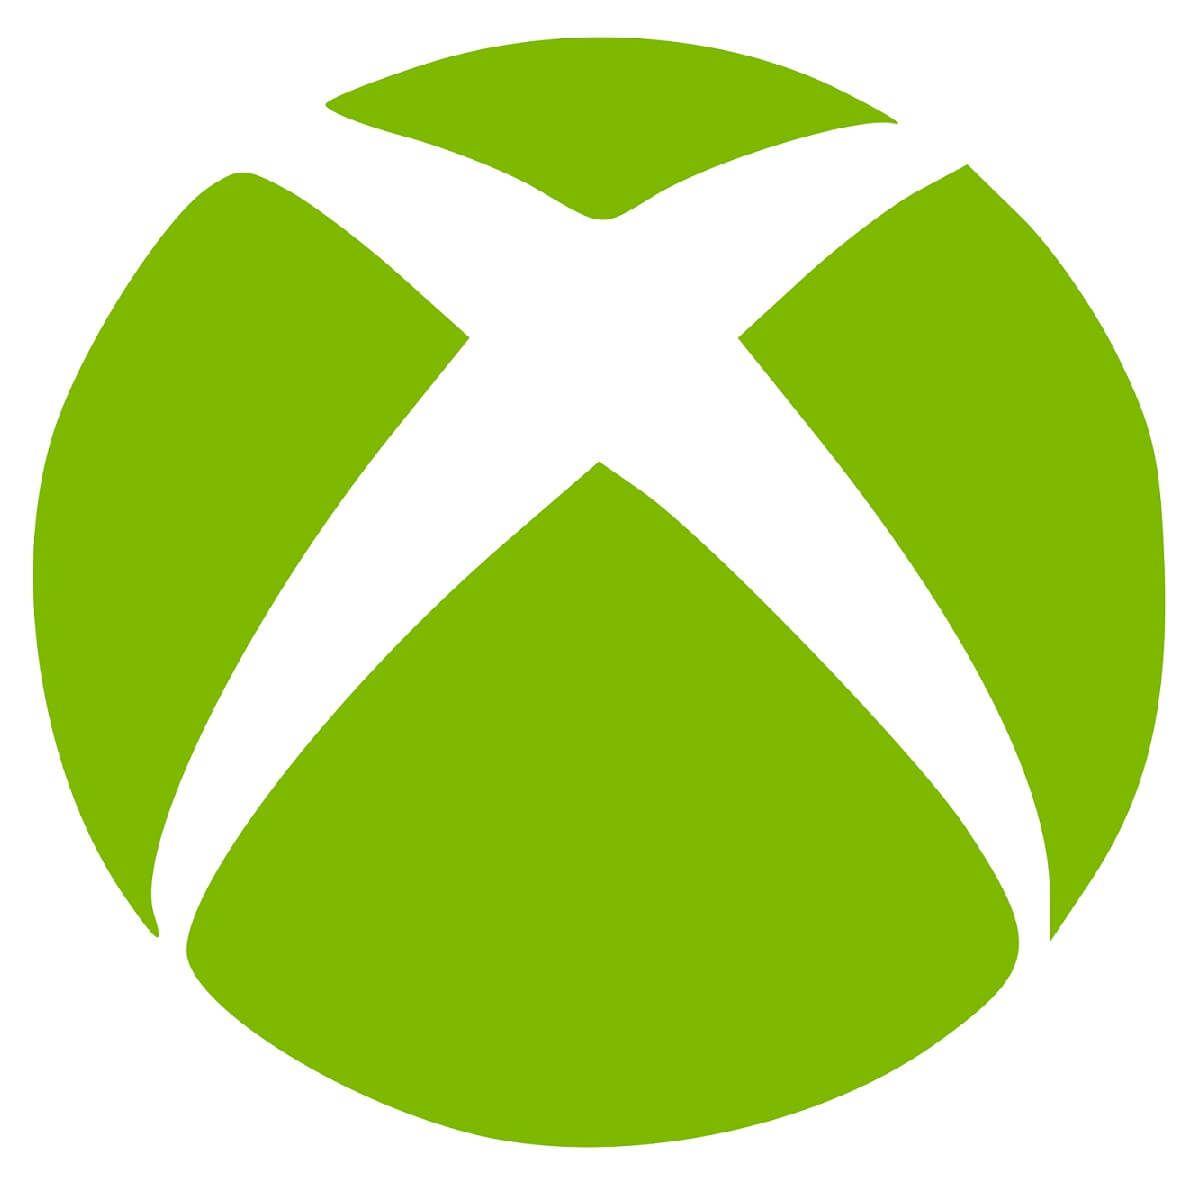 FIX Xbox One error code 0x97e10bca (With images) Xbox